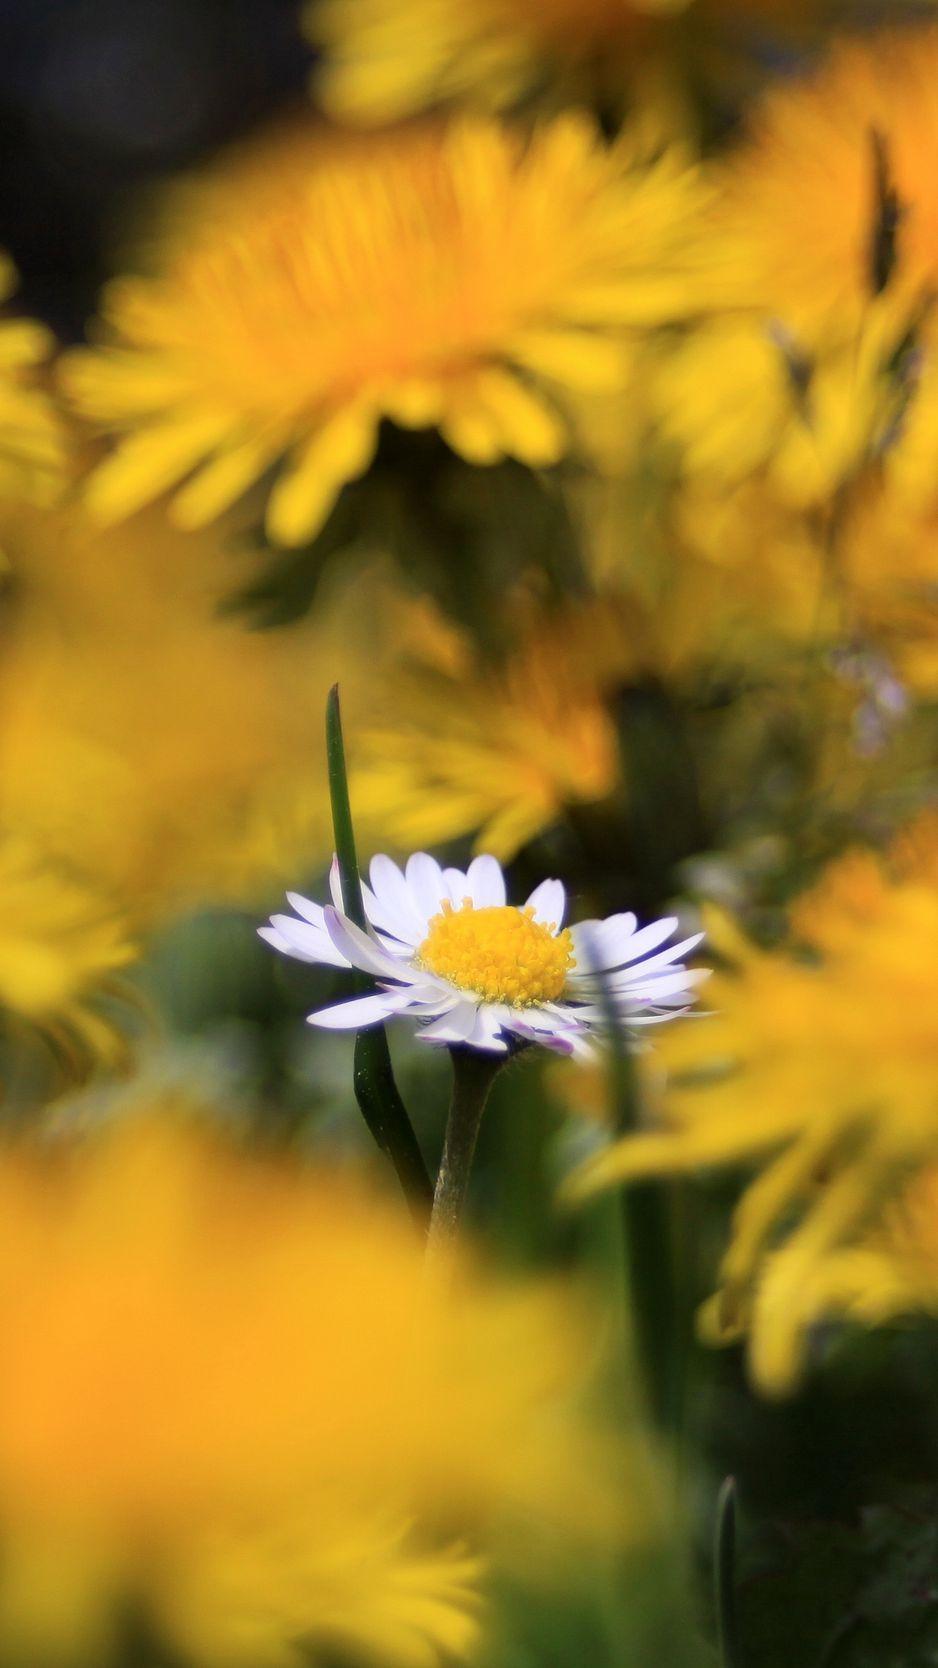 938x1668 Wallpaper daisy, wildflower, summer, blurring